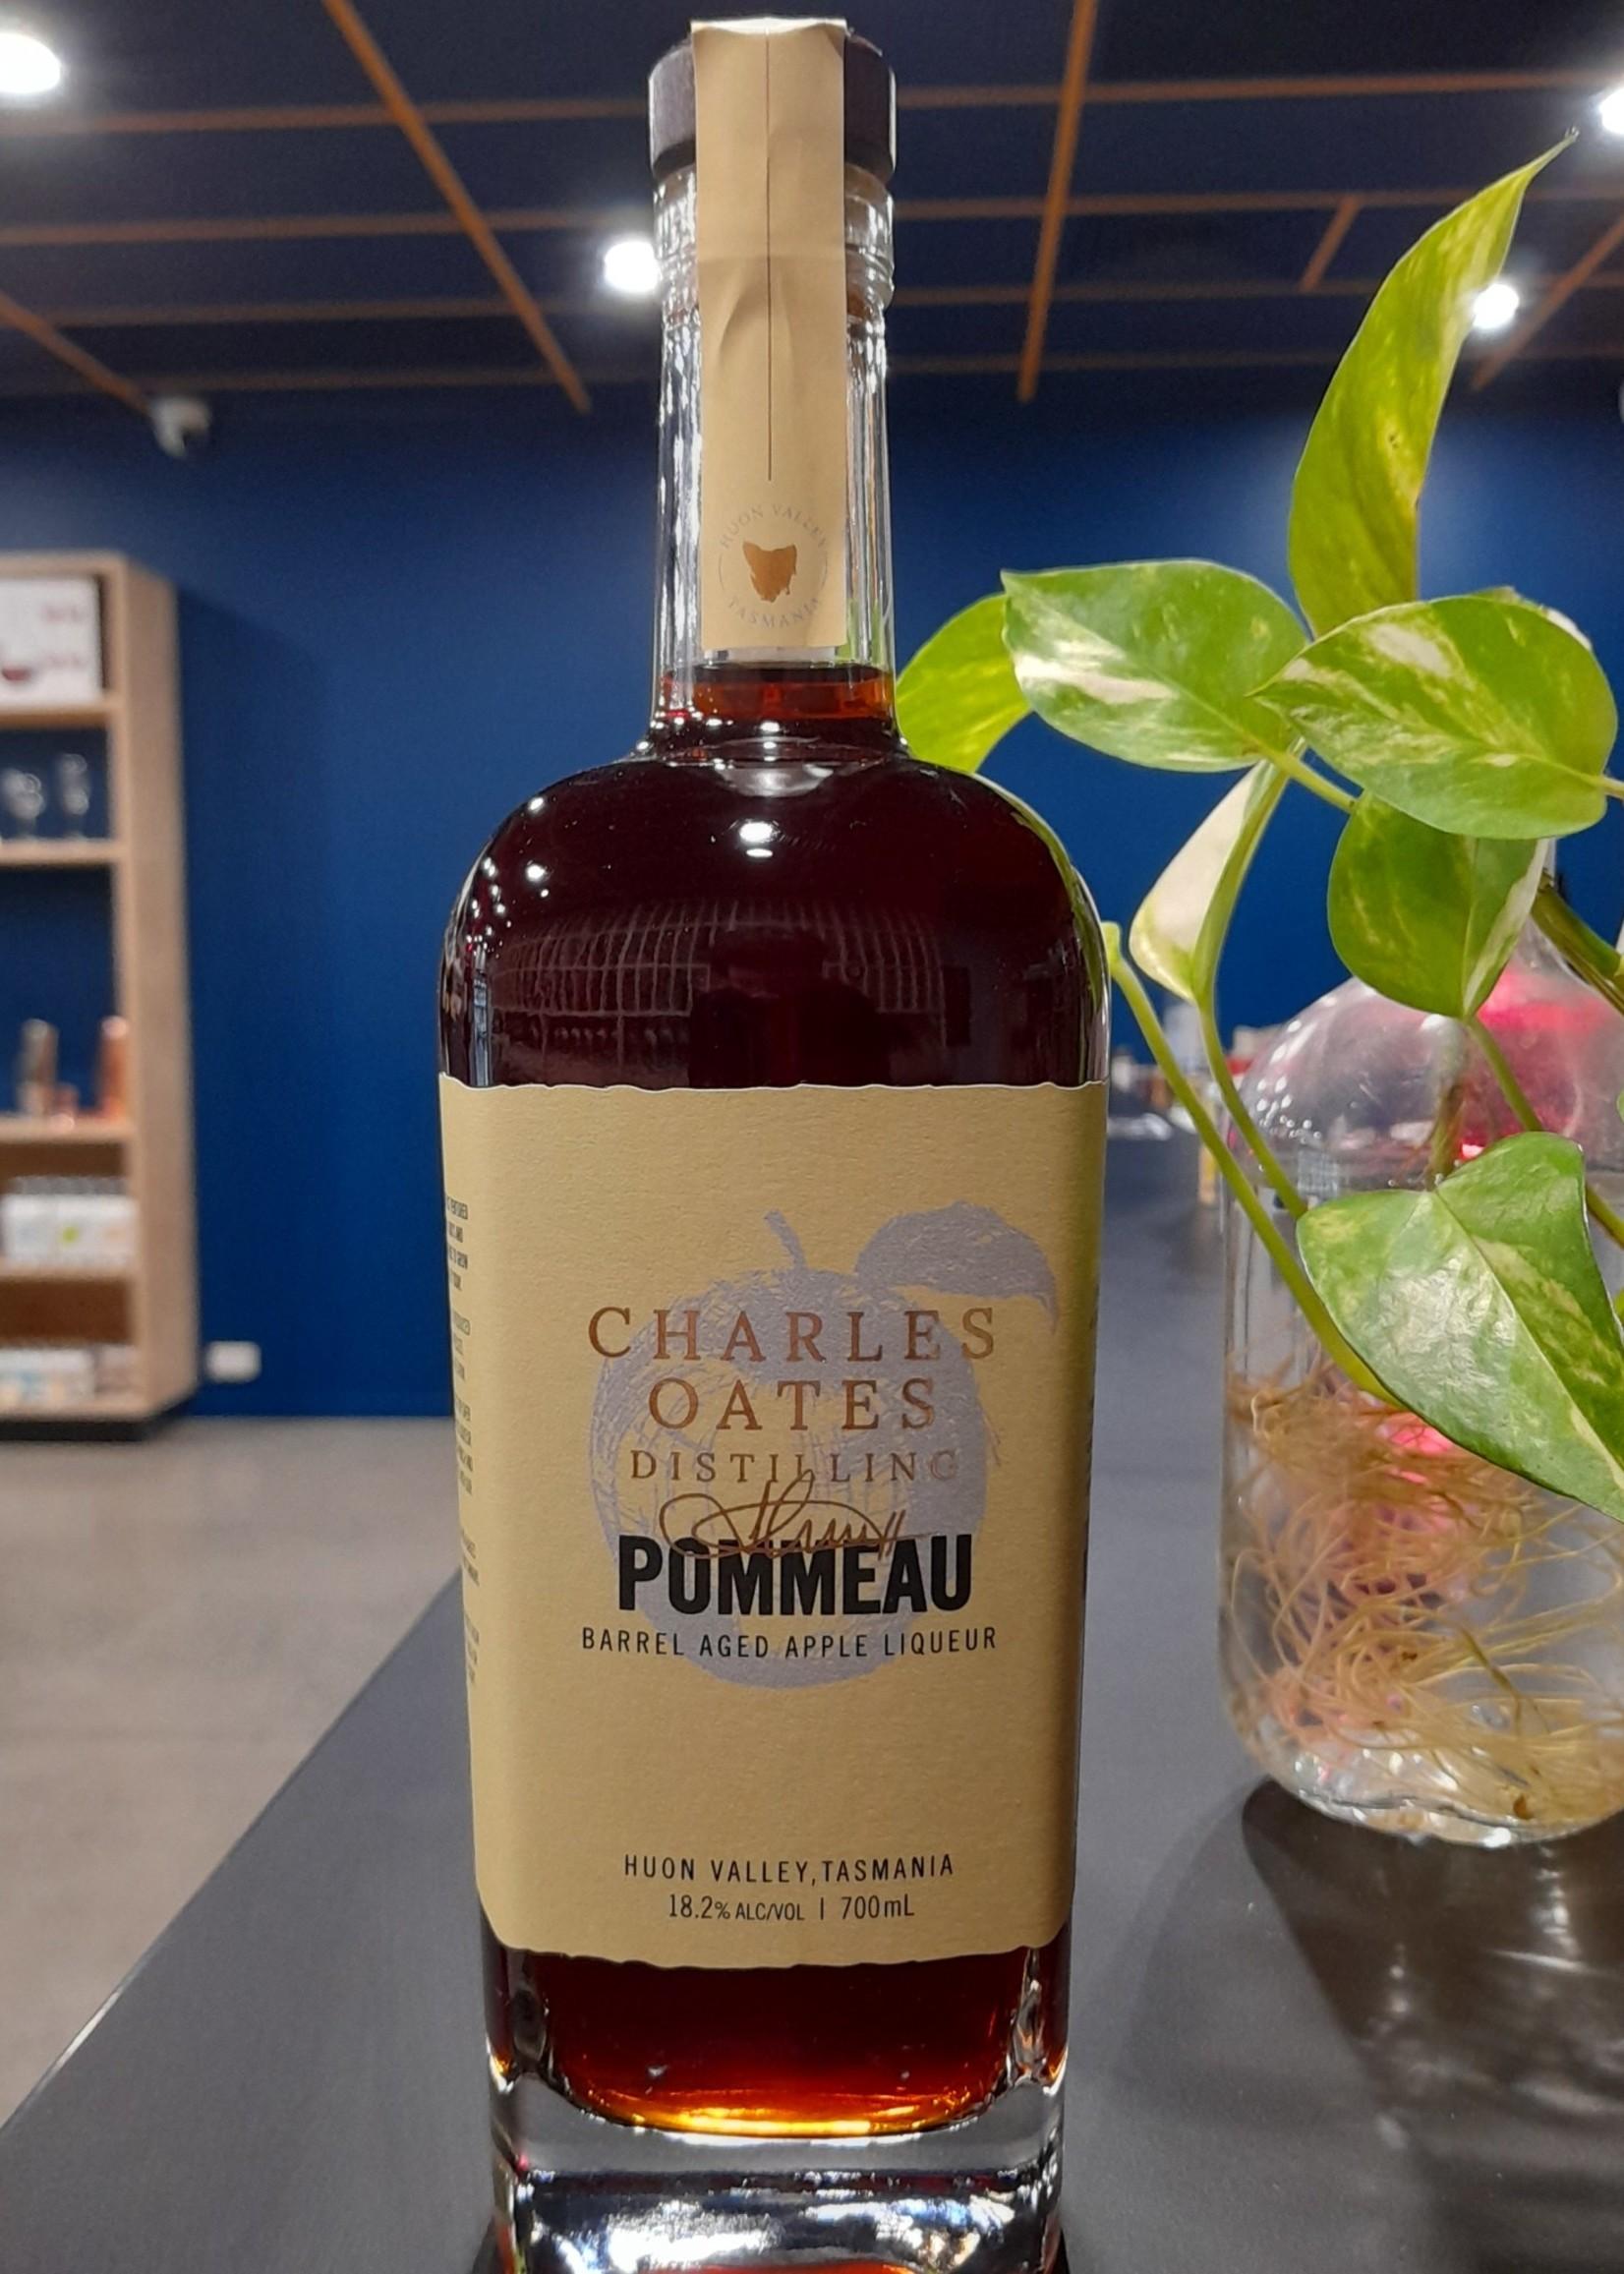 Charles Oates Charles Oates Pommeau de Tasmaine 700ml